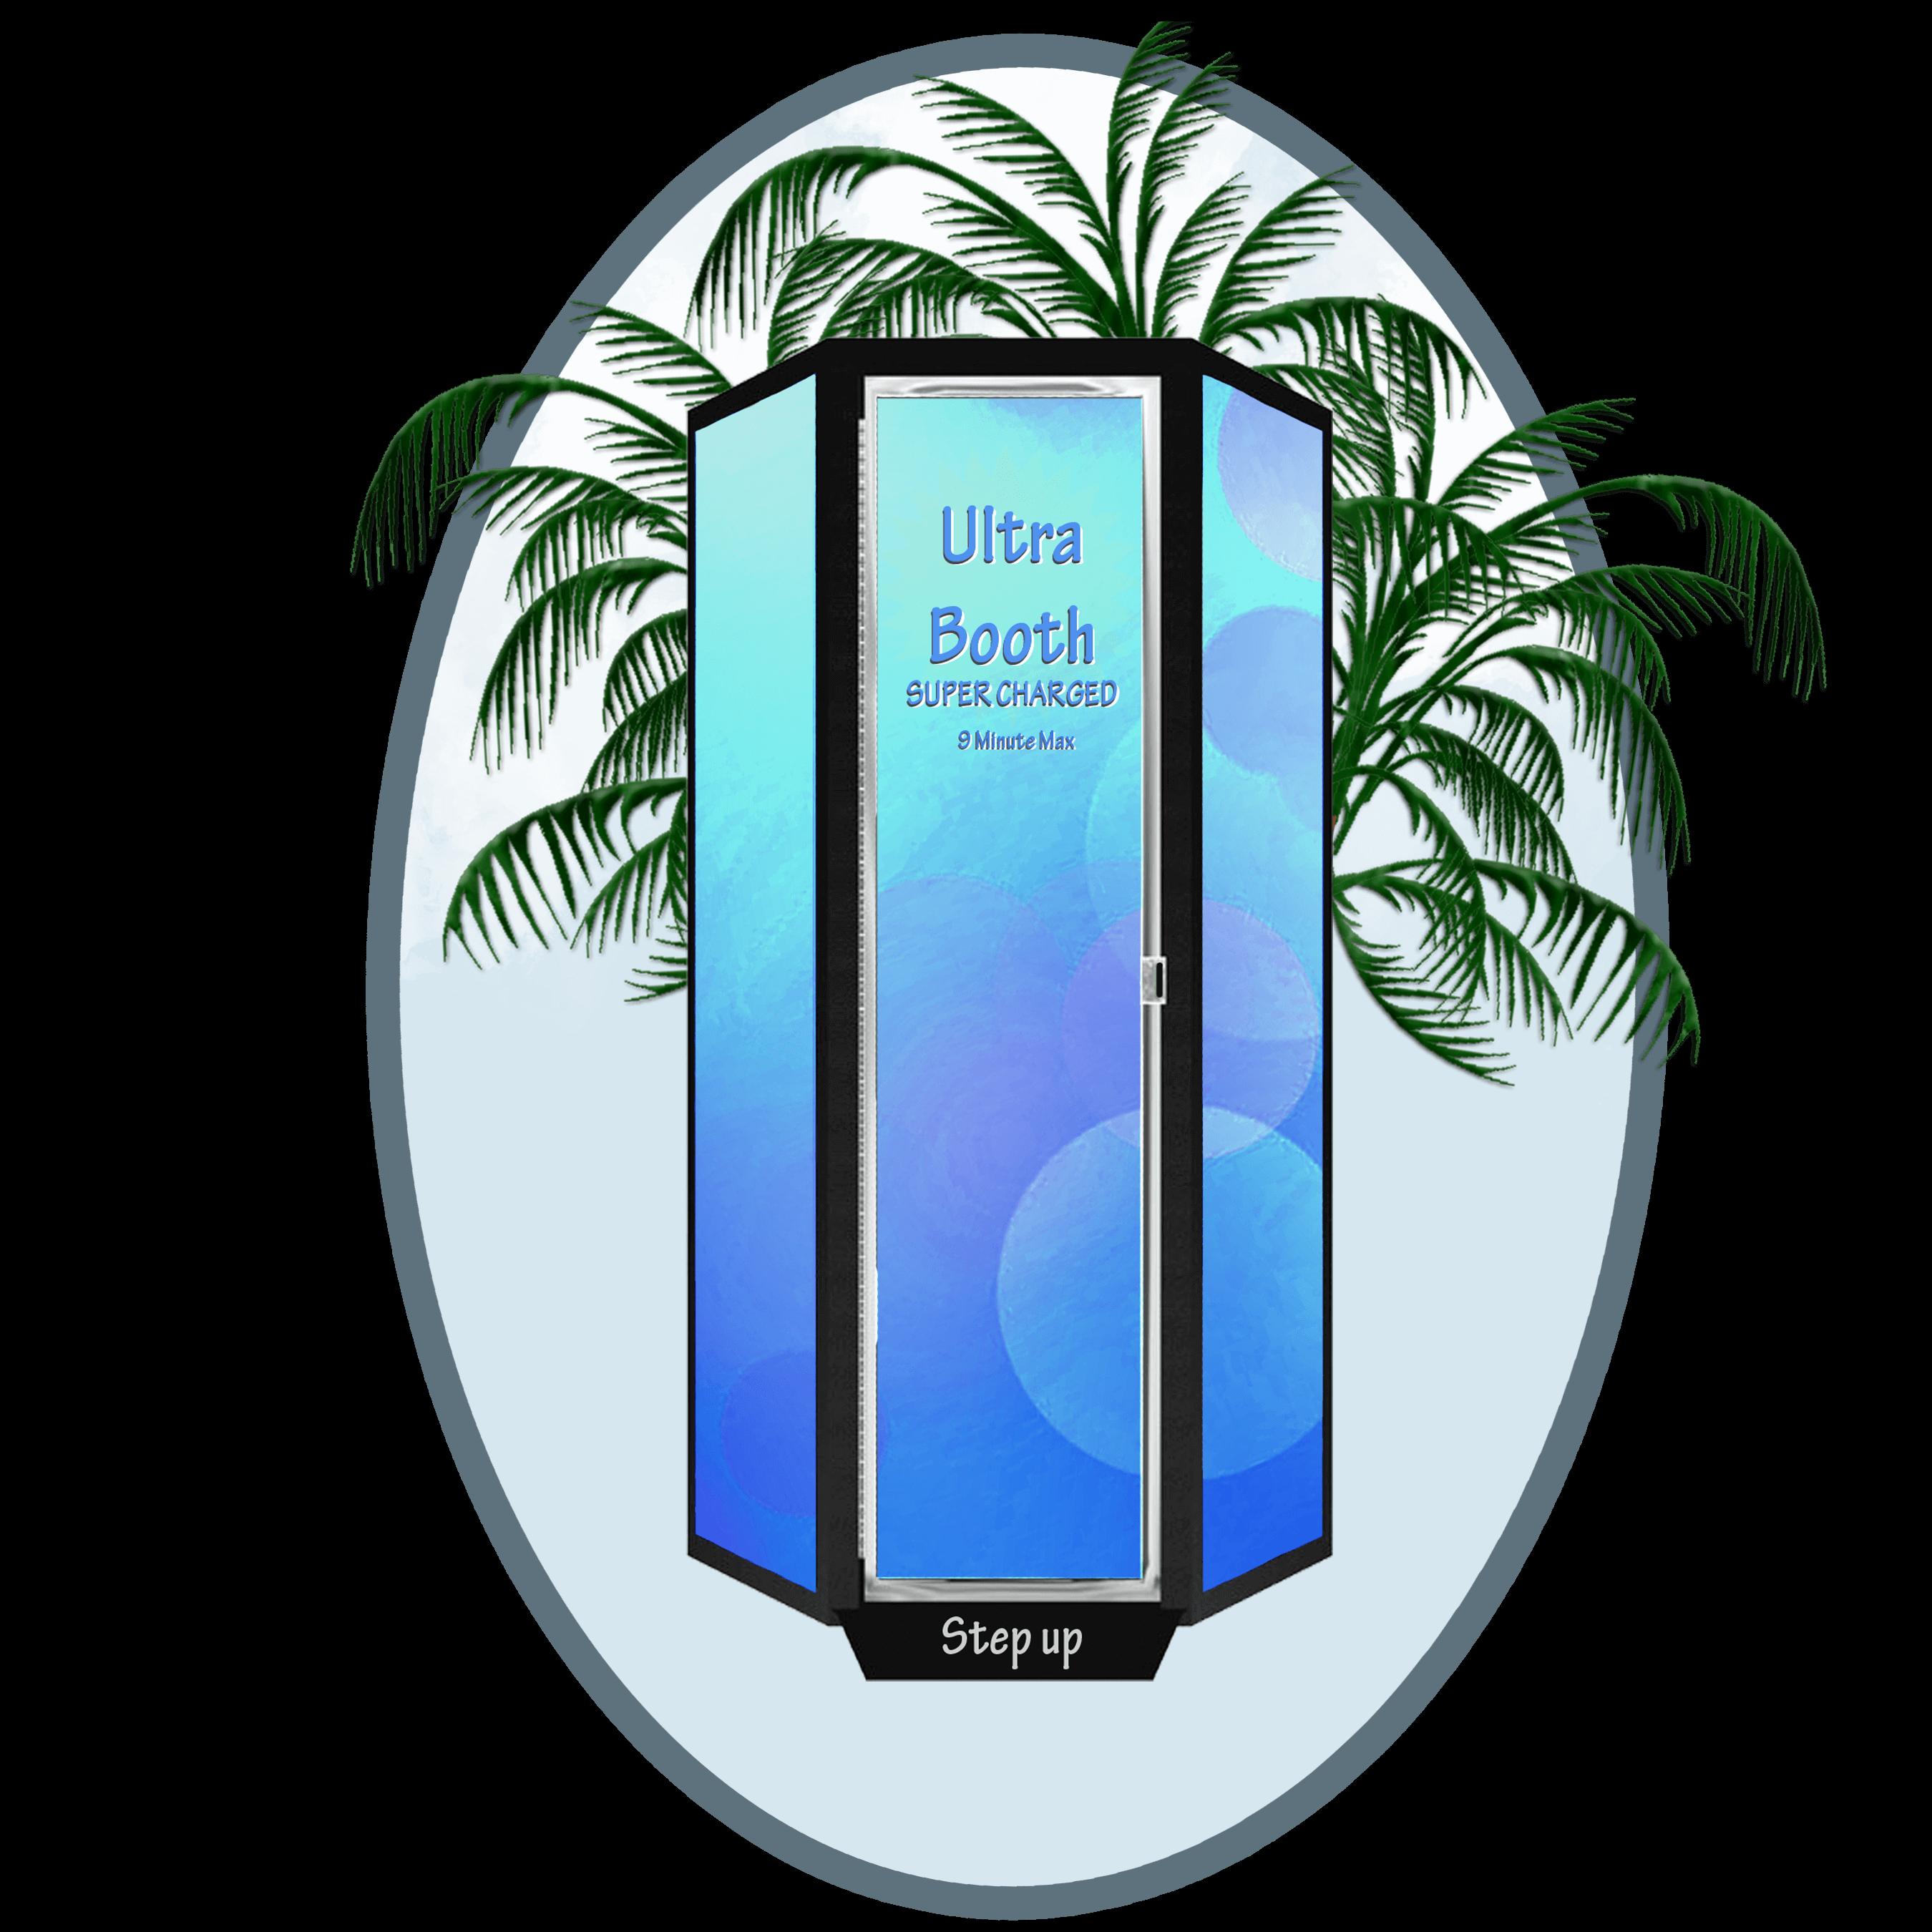 Booth-2-2 BluPlmOVL